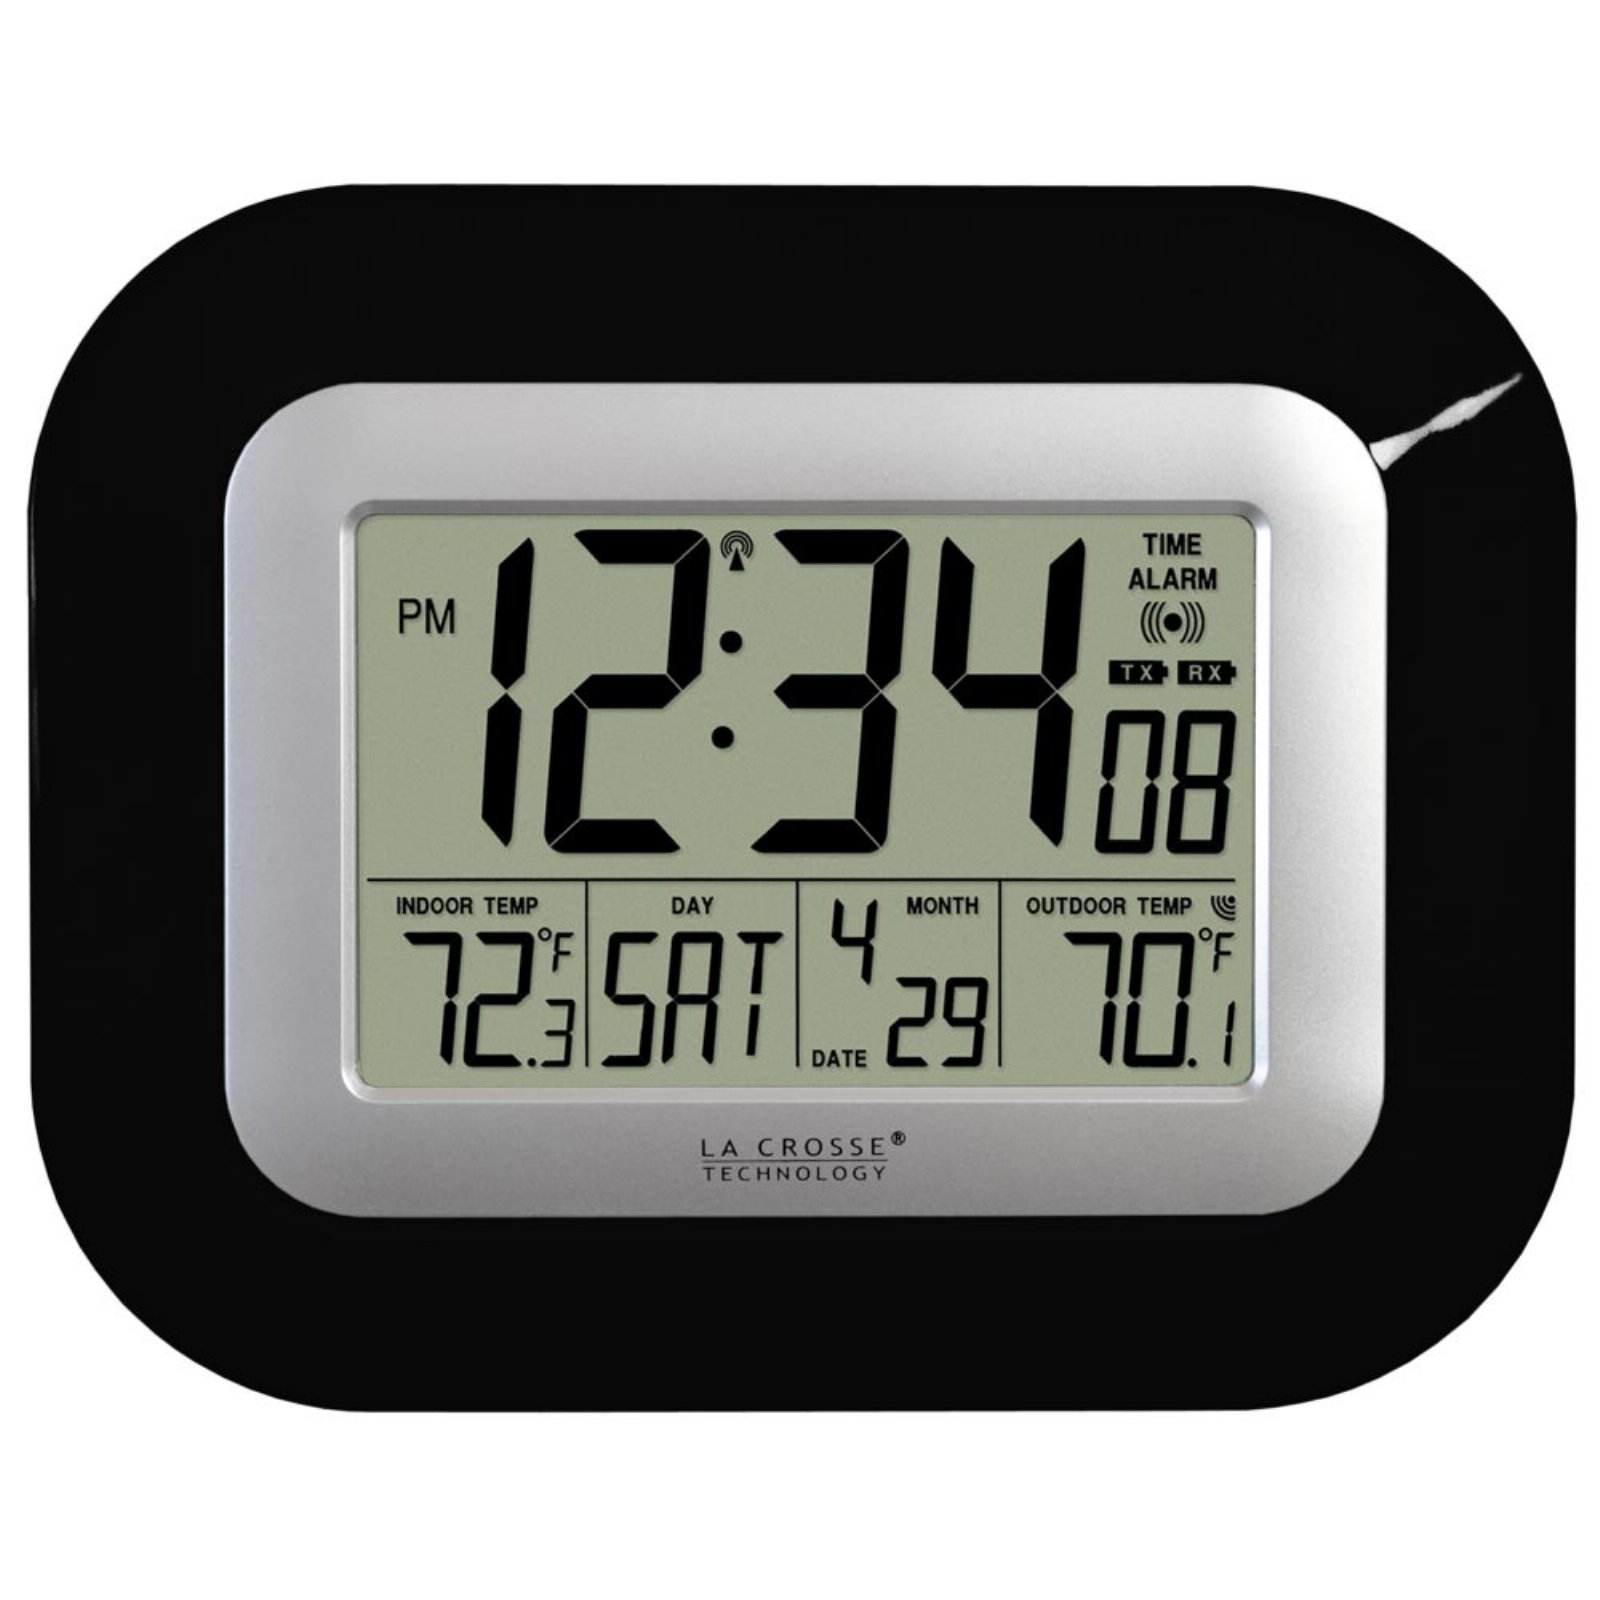 La Crosse Technology WS-8115U-B Atomic Digital Wall Clock with Temperature